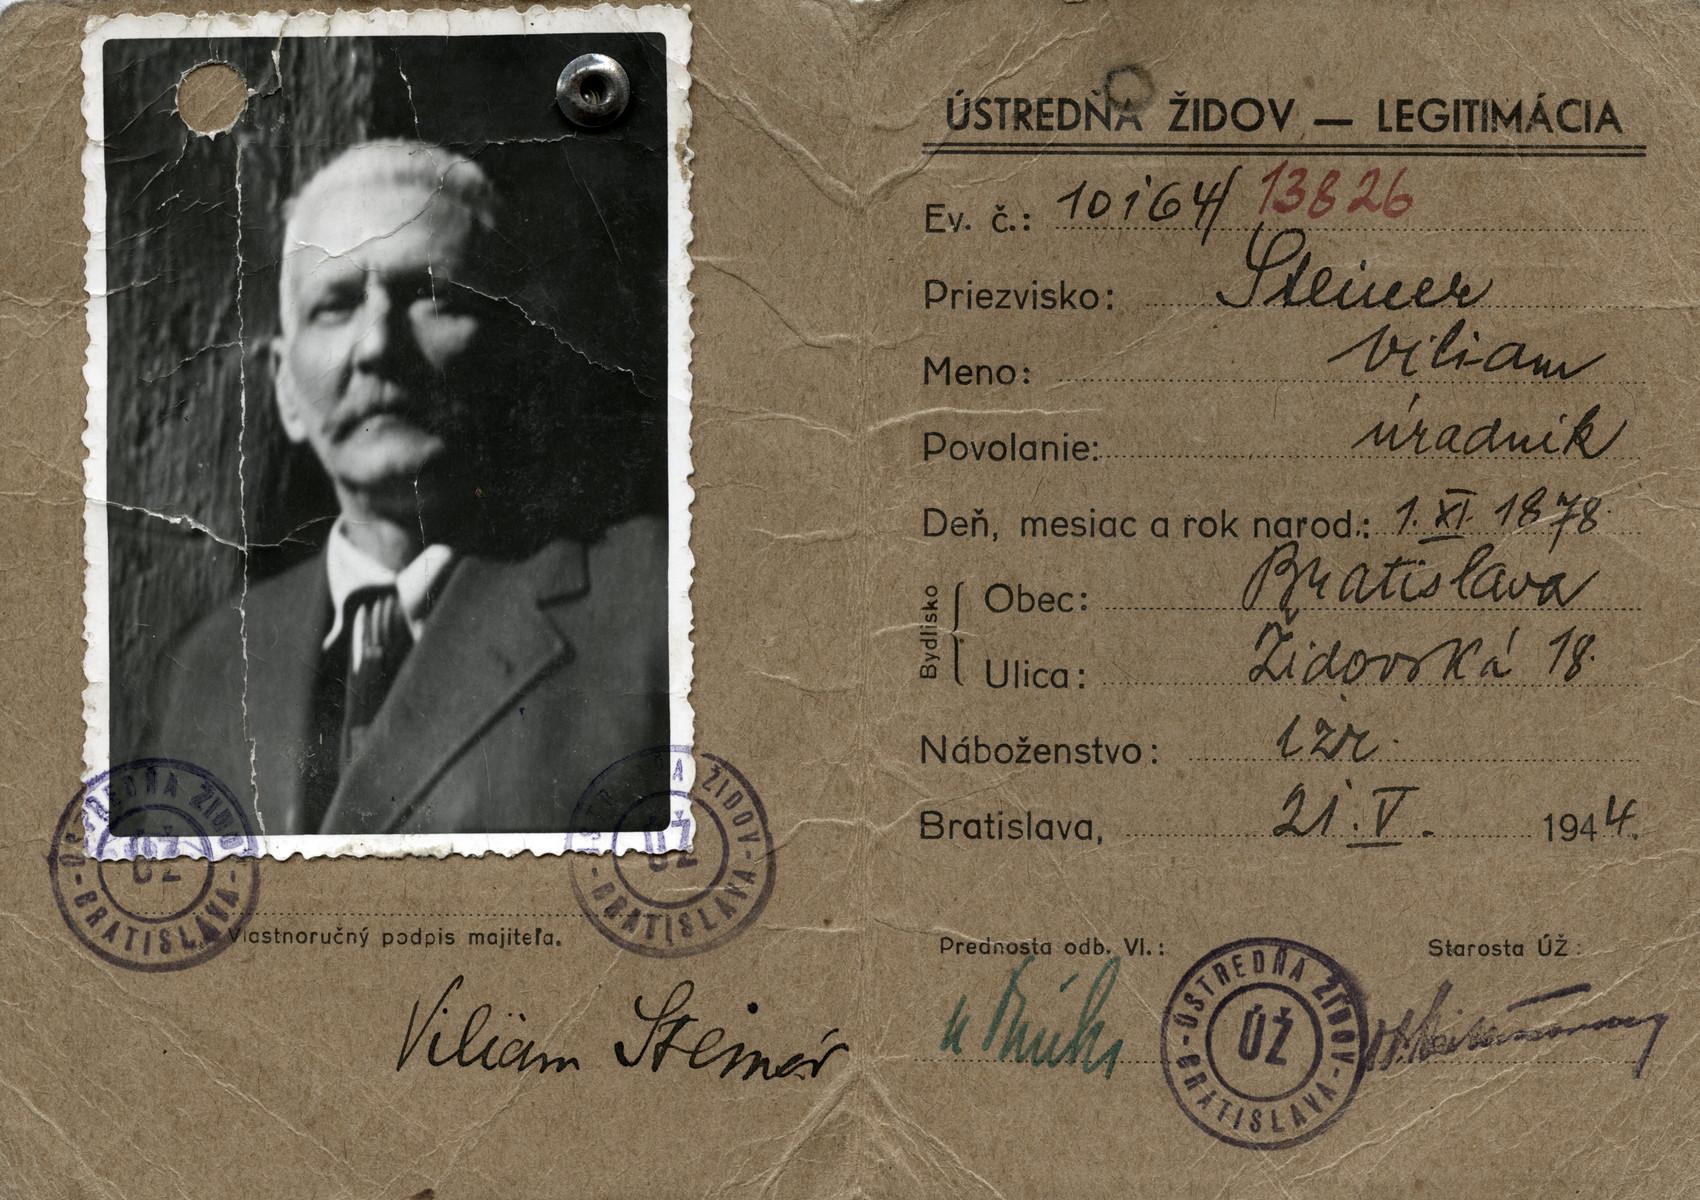 Identification card issued to Wilhelm Zeen Steiner by the Bratislava Jewish Council.